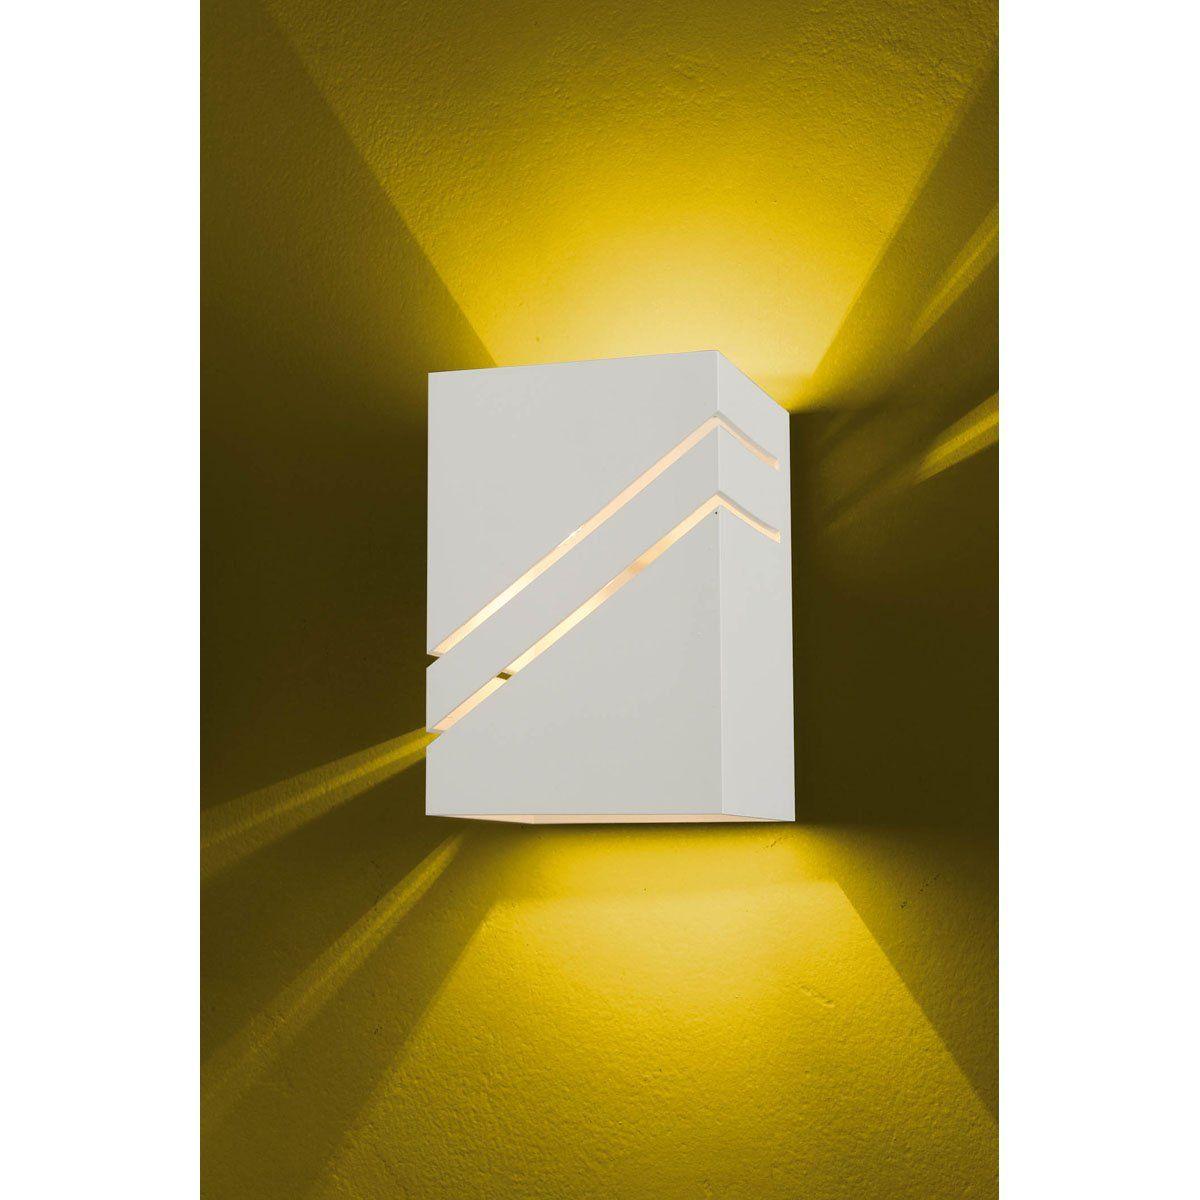 Arandela Flash tubo quadrada 02L Diagonal 01 GU9 Tampa Policarbonato com AntiUV - Branco